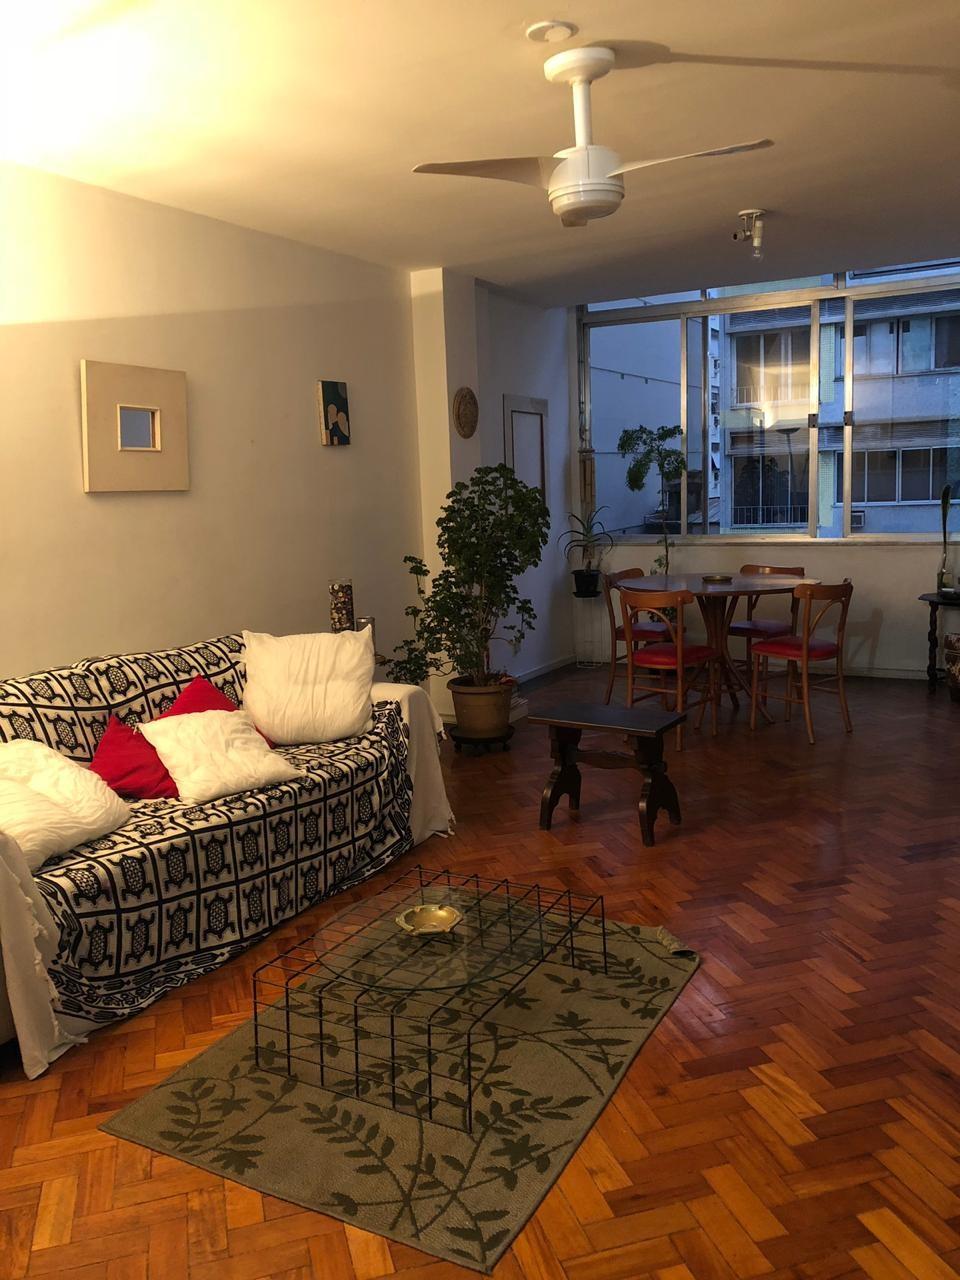 accommodation-1-2-coliving-da42ddaaaa3bc70ef3747ea1bb4e9a6b